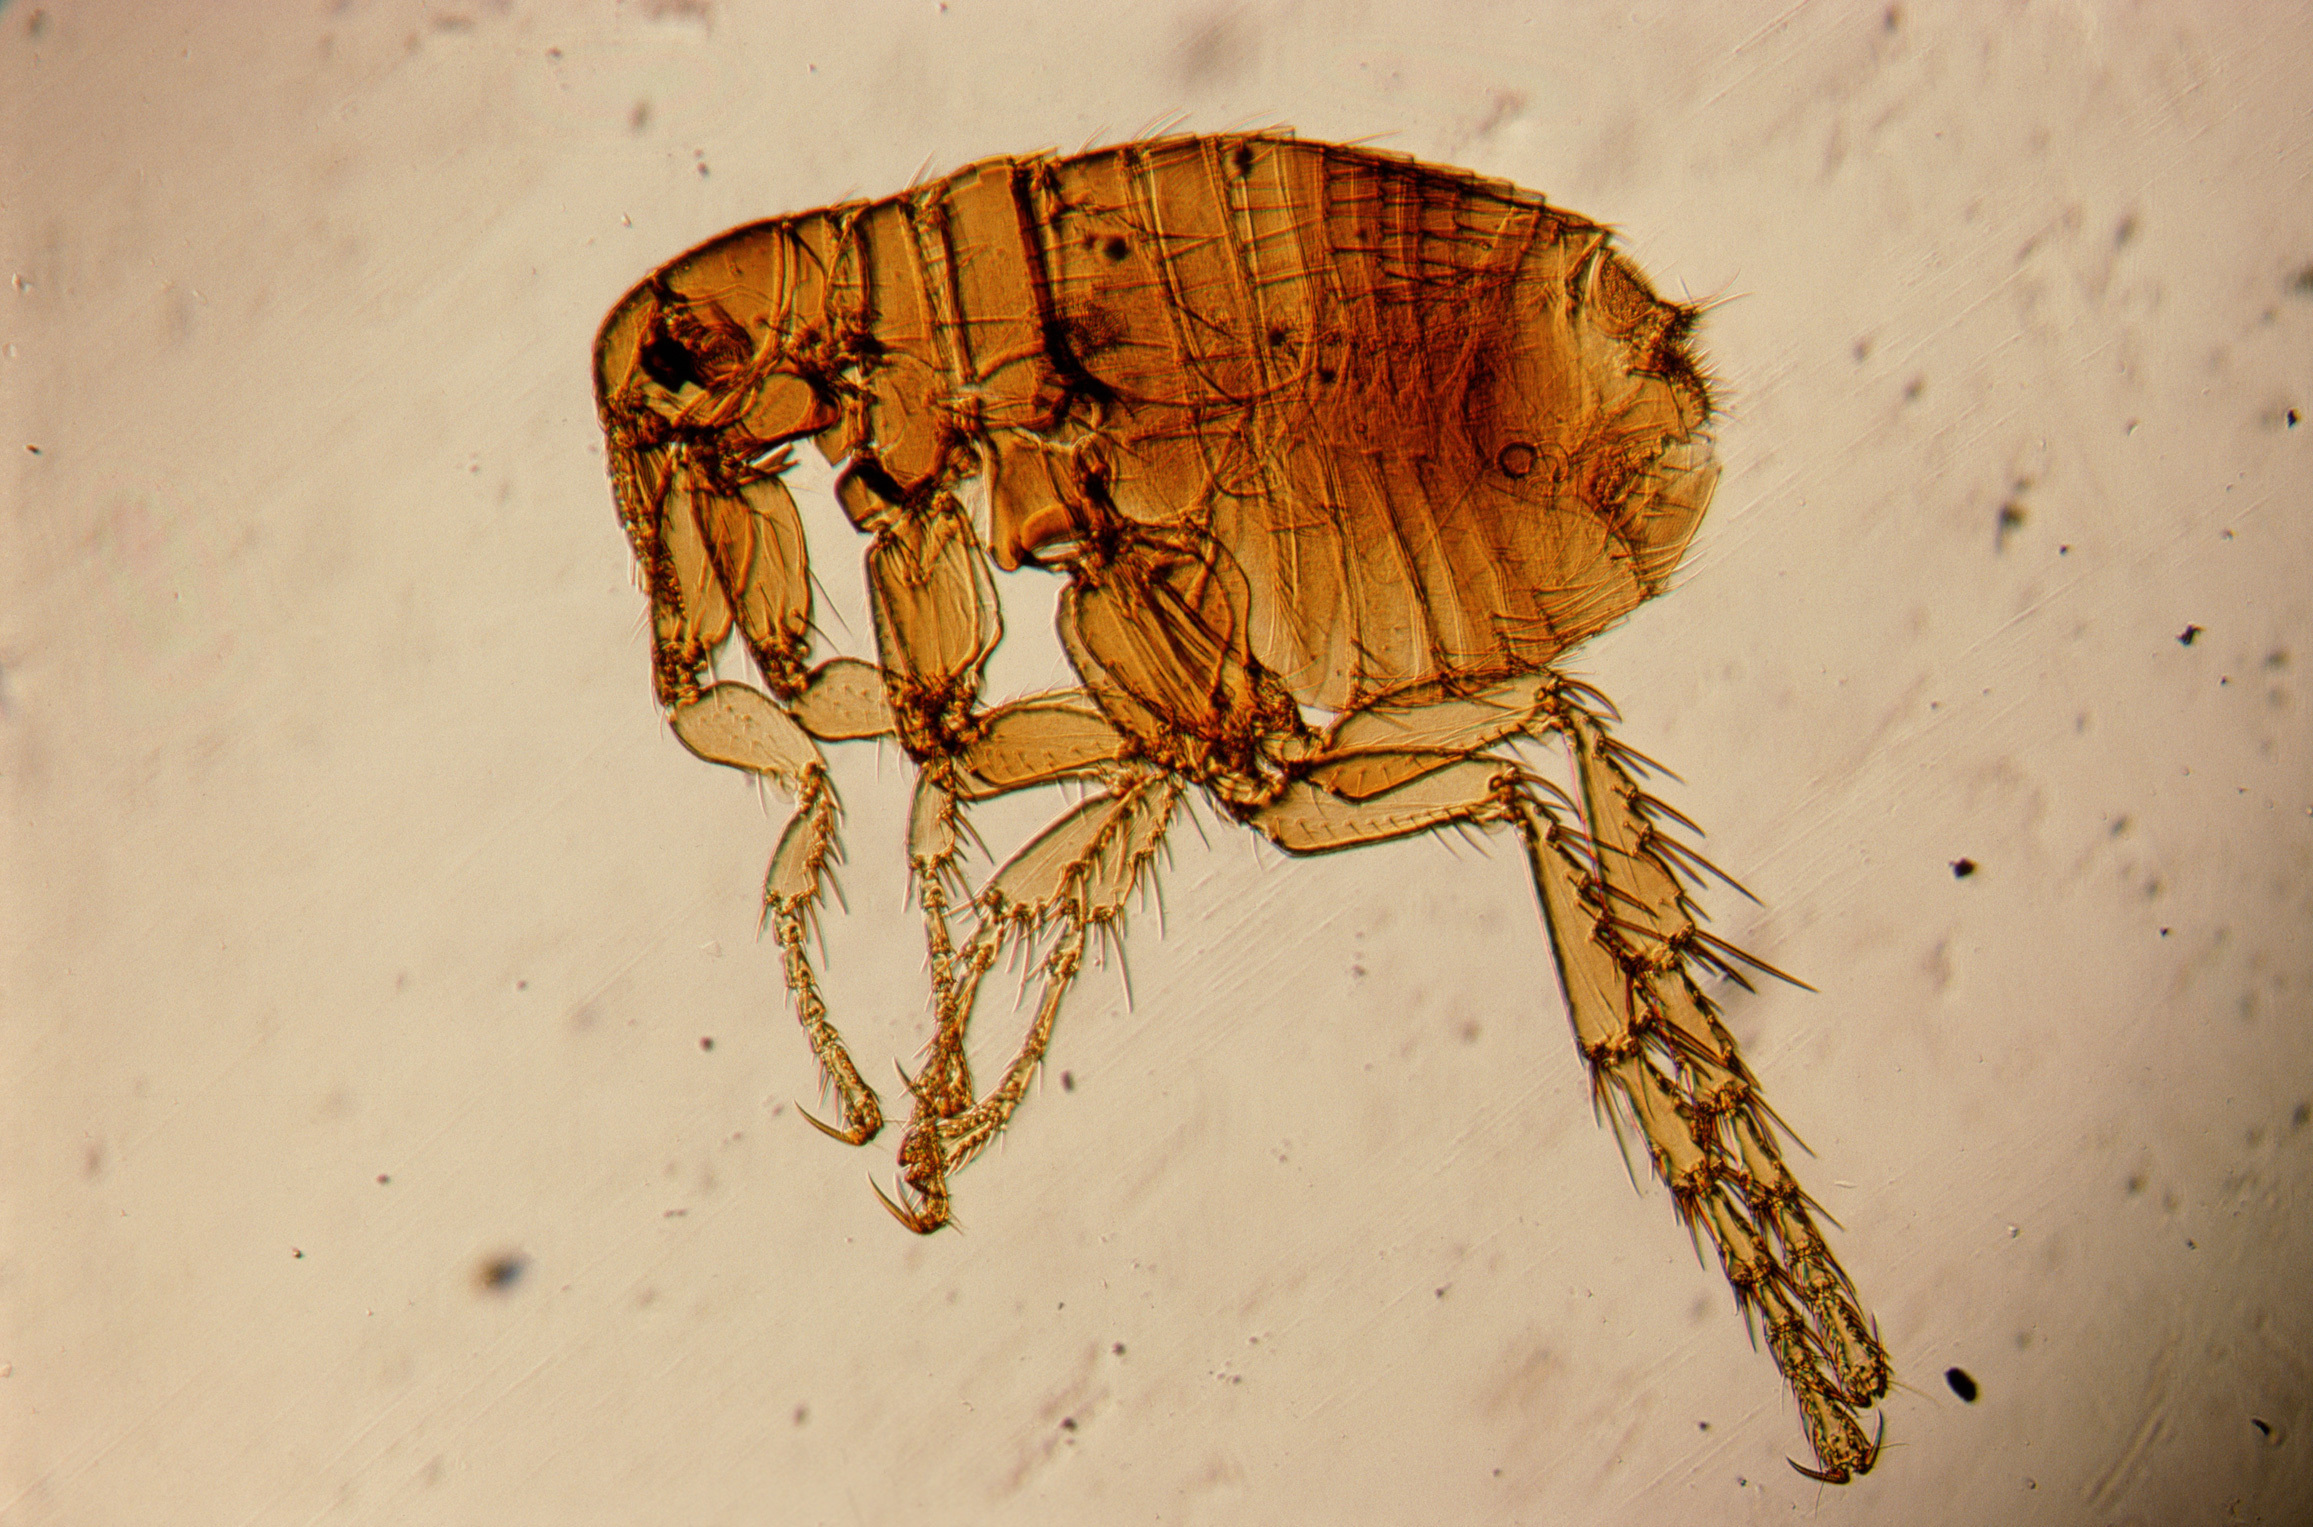 328882_bloxa_nasekomye_pod-mikroskopom_2313x1527_(www.GetBg.net)